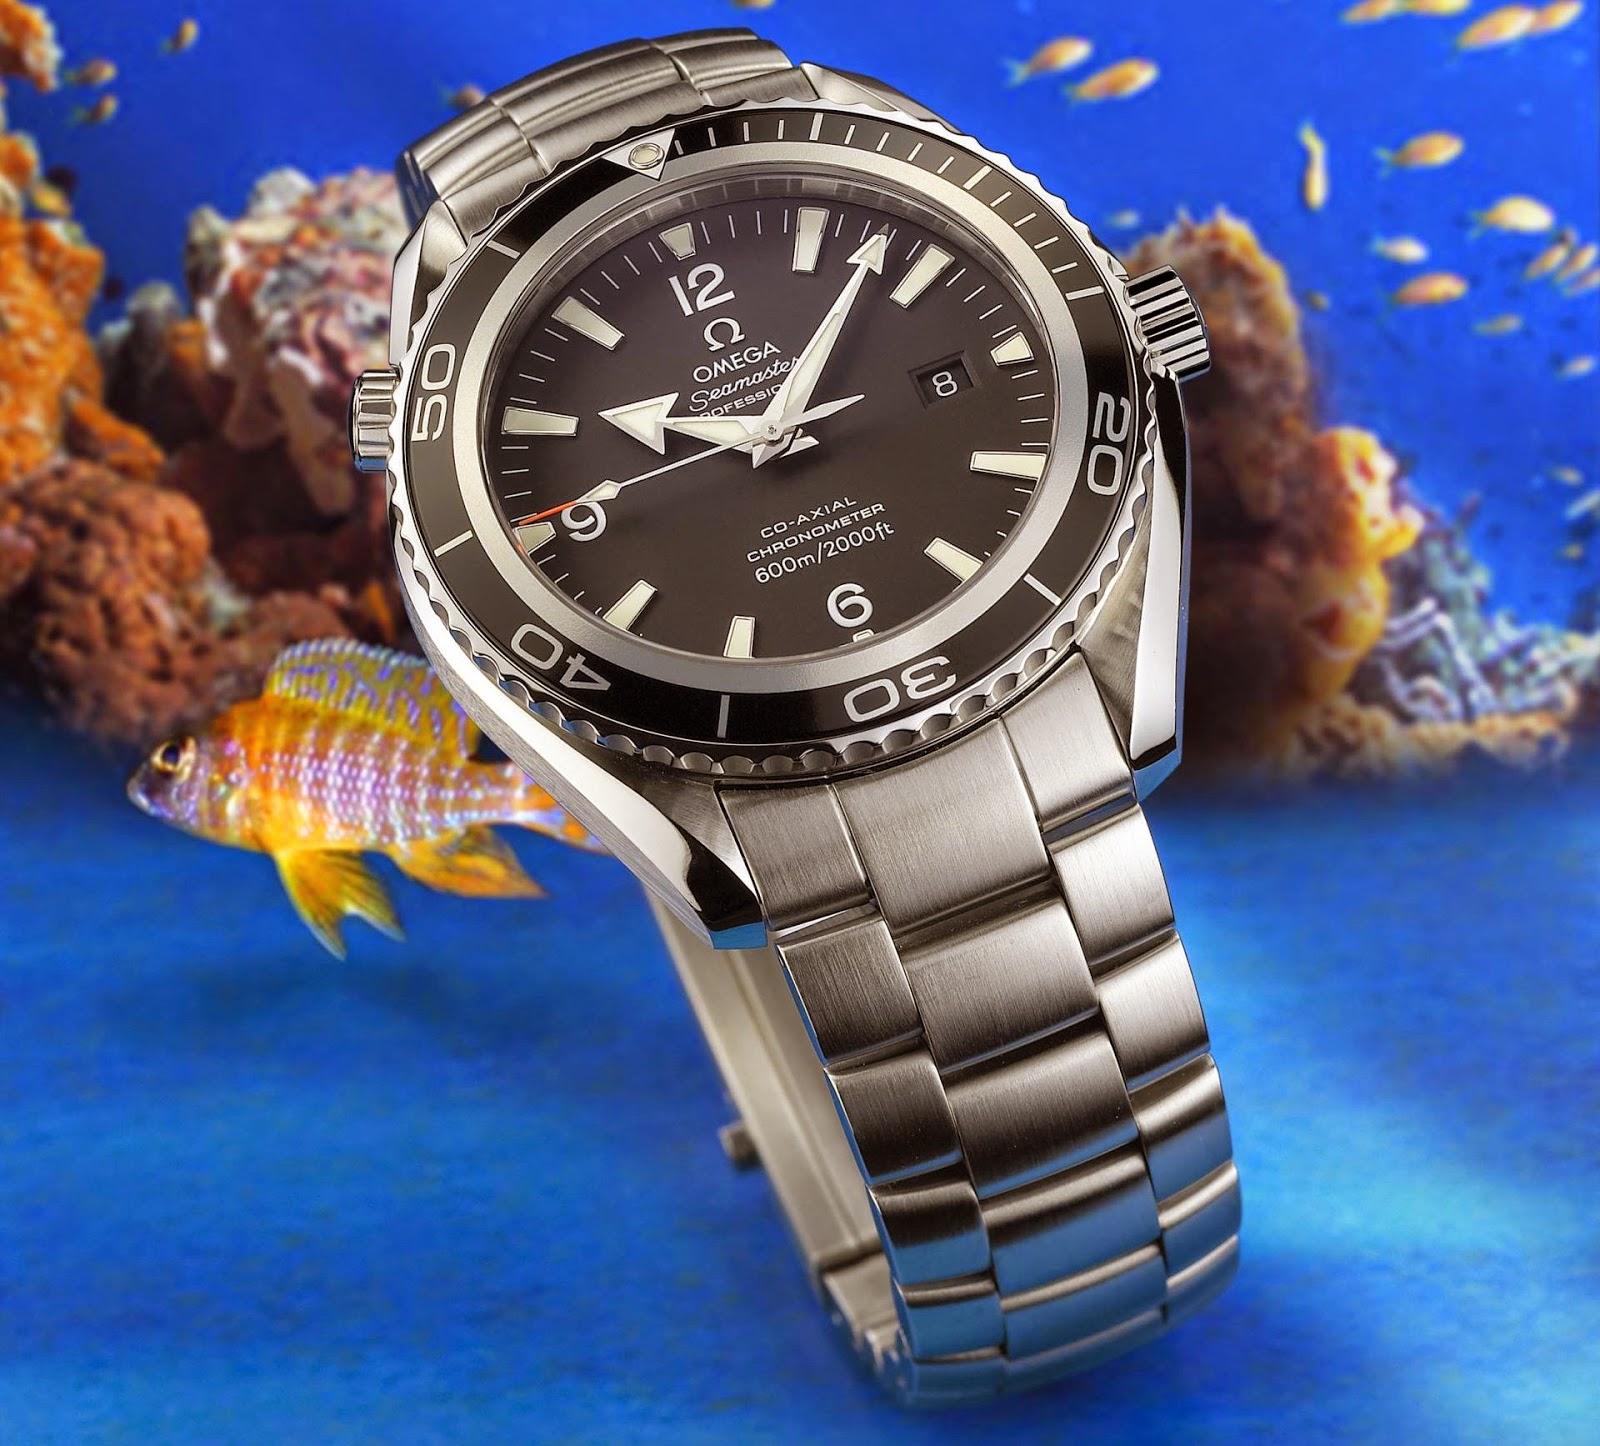 OMEGA Seamaster Planet Ocean, Edition 2005